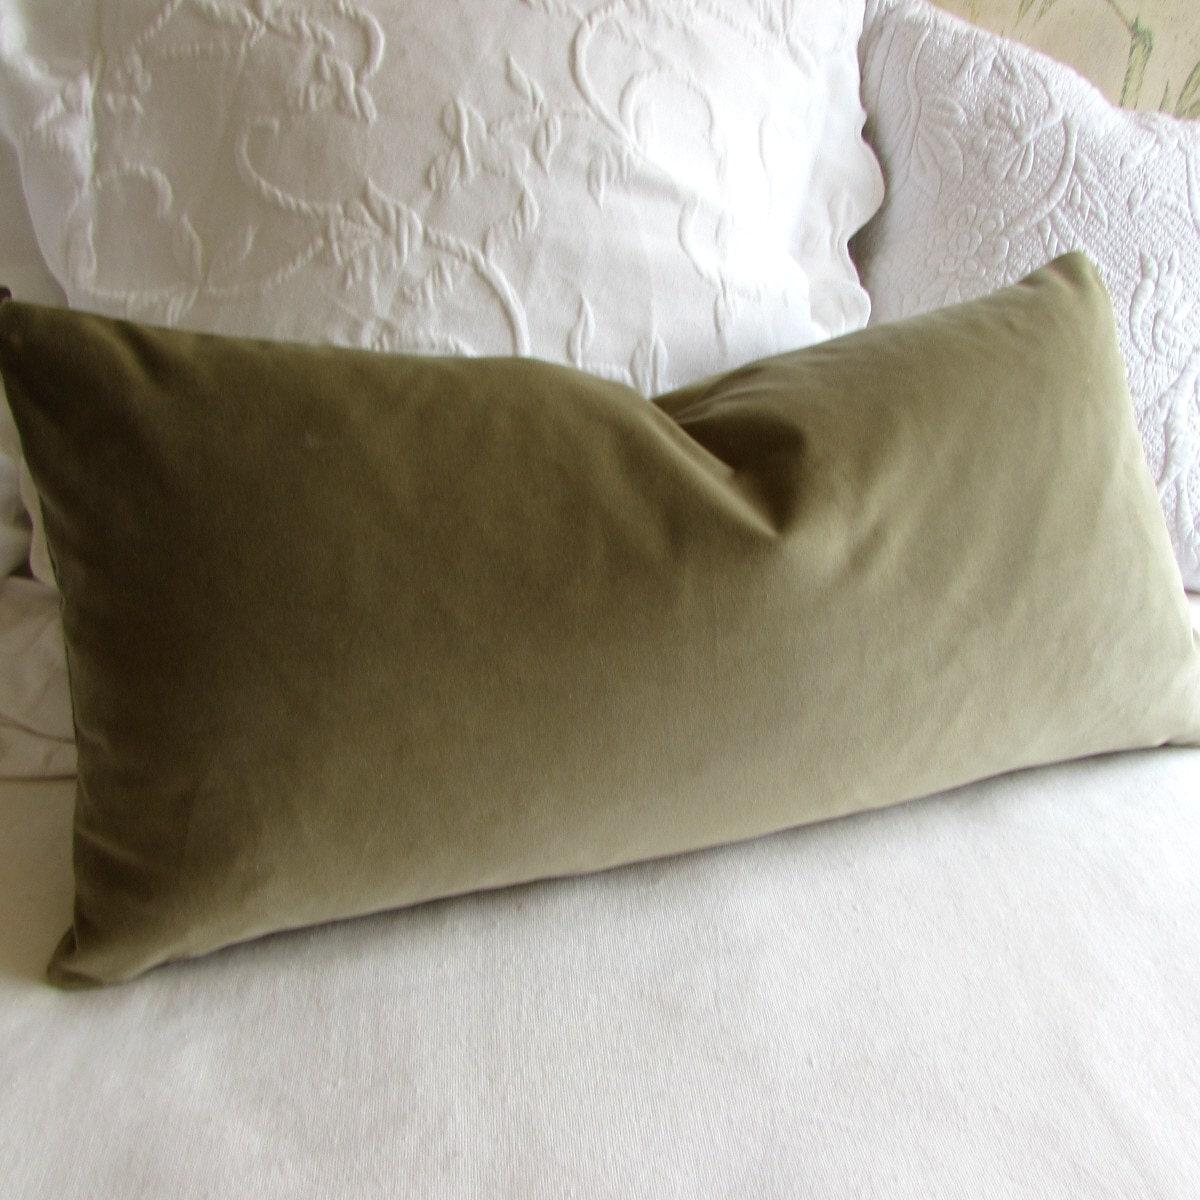 Sage Olive Velvet Lumbar Rectangular Bolster Pillow 13x26